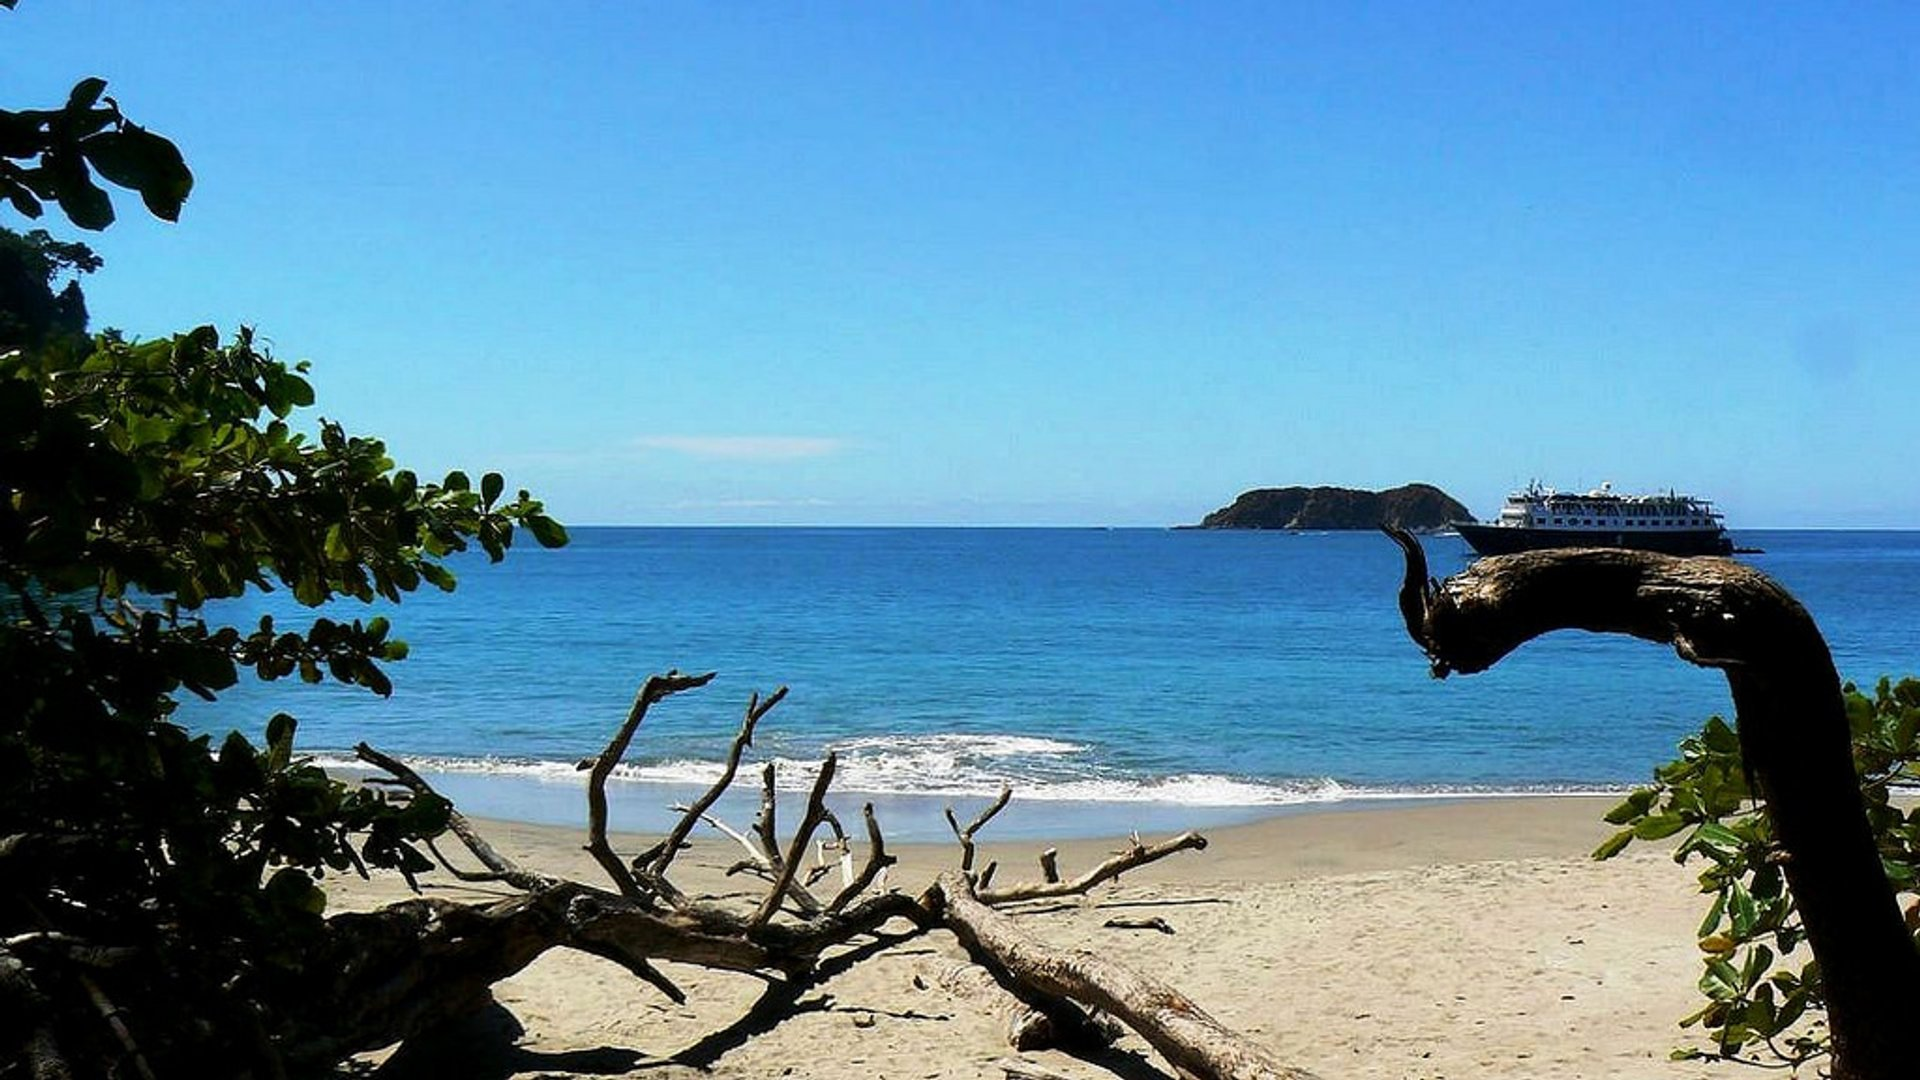 Dry Season (Winter) in Costa Rica 2020 - Best Time